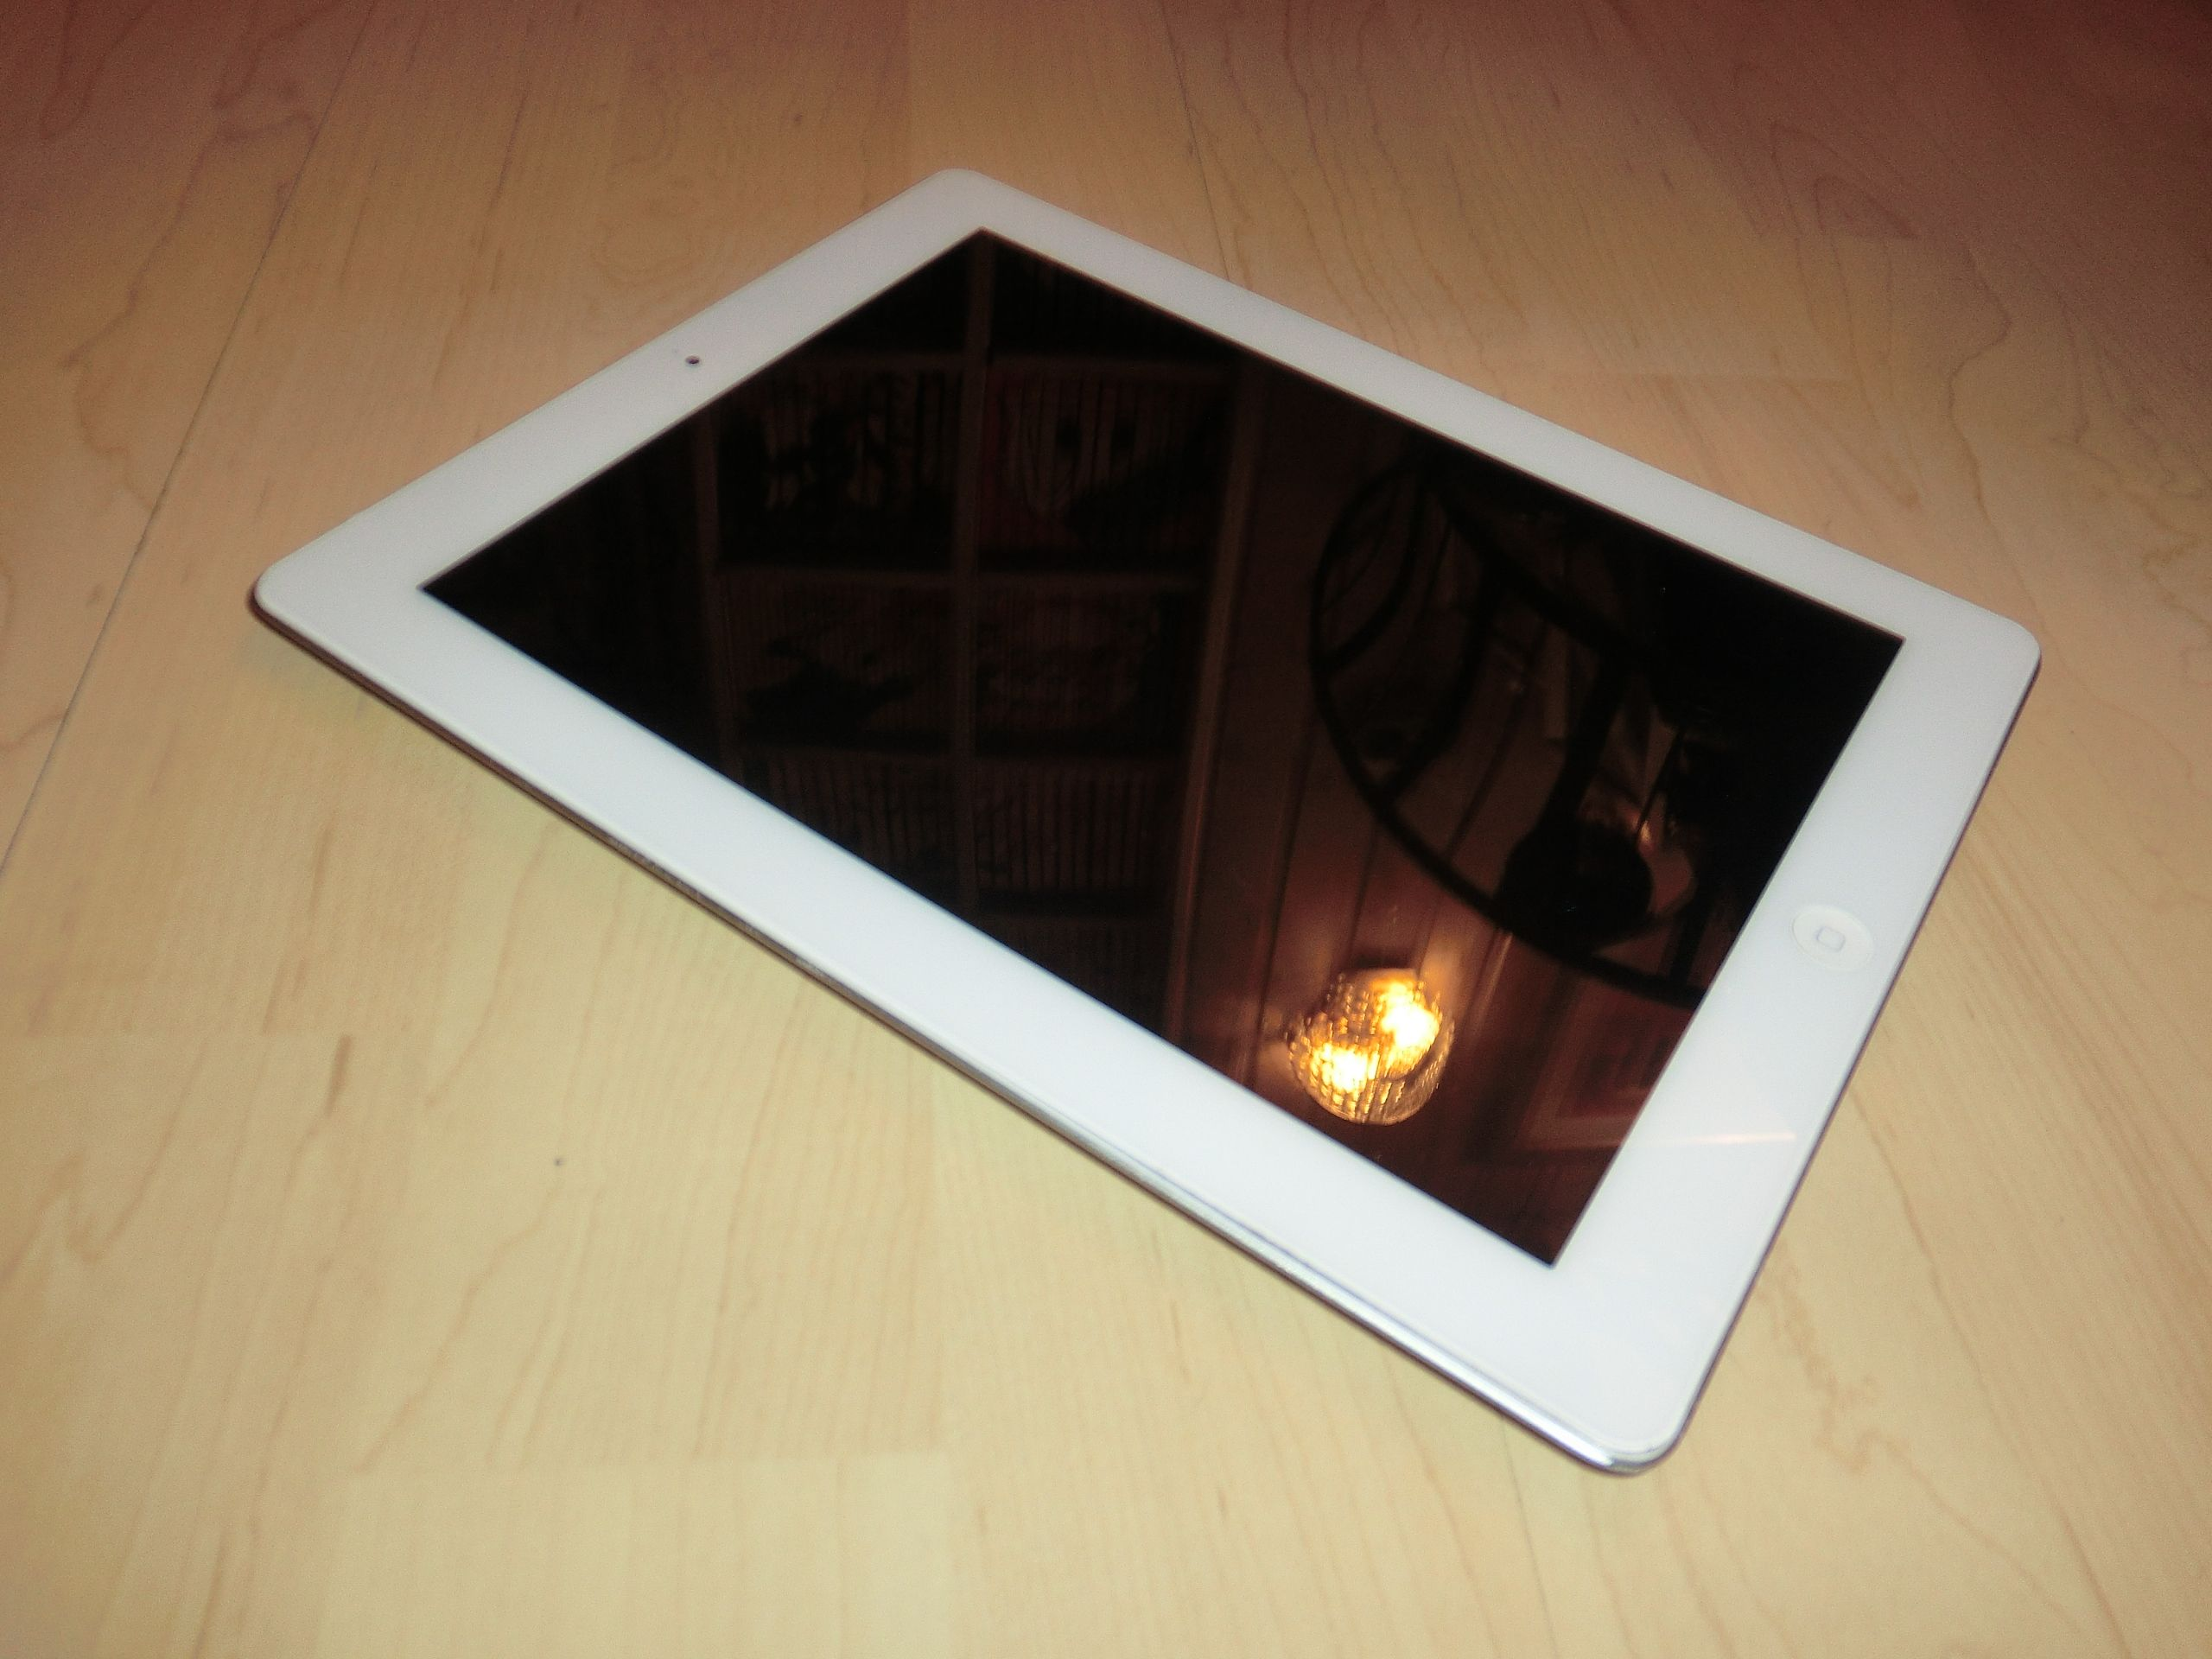 apple ipad 2 wei 64gb umts 3g ohne simlock 1 jahr. Black Bedroom Furniture Sets. Home Design Ideas